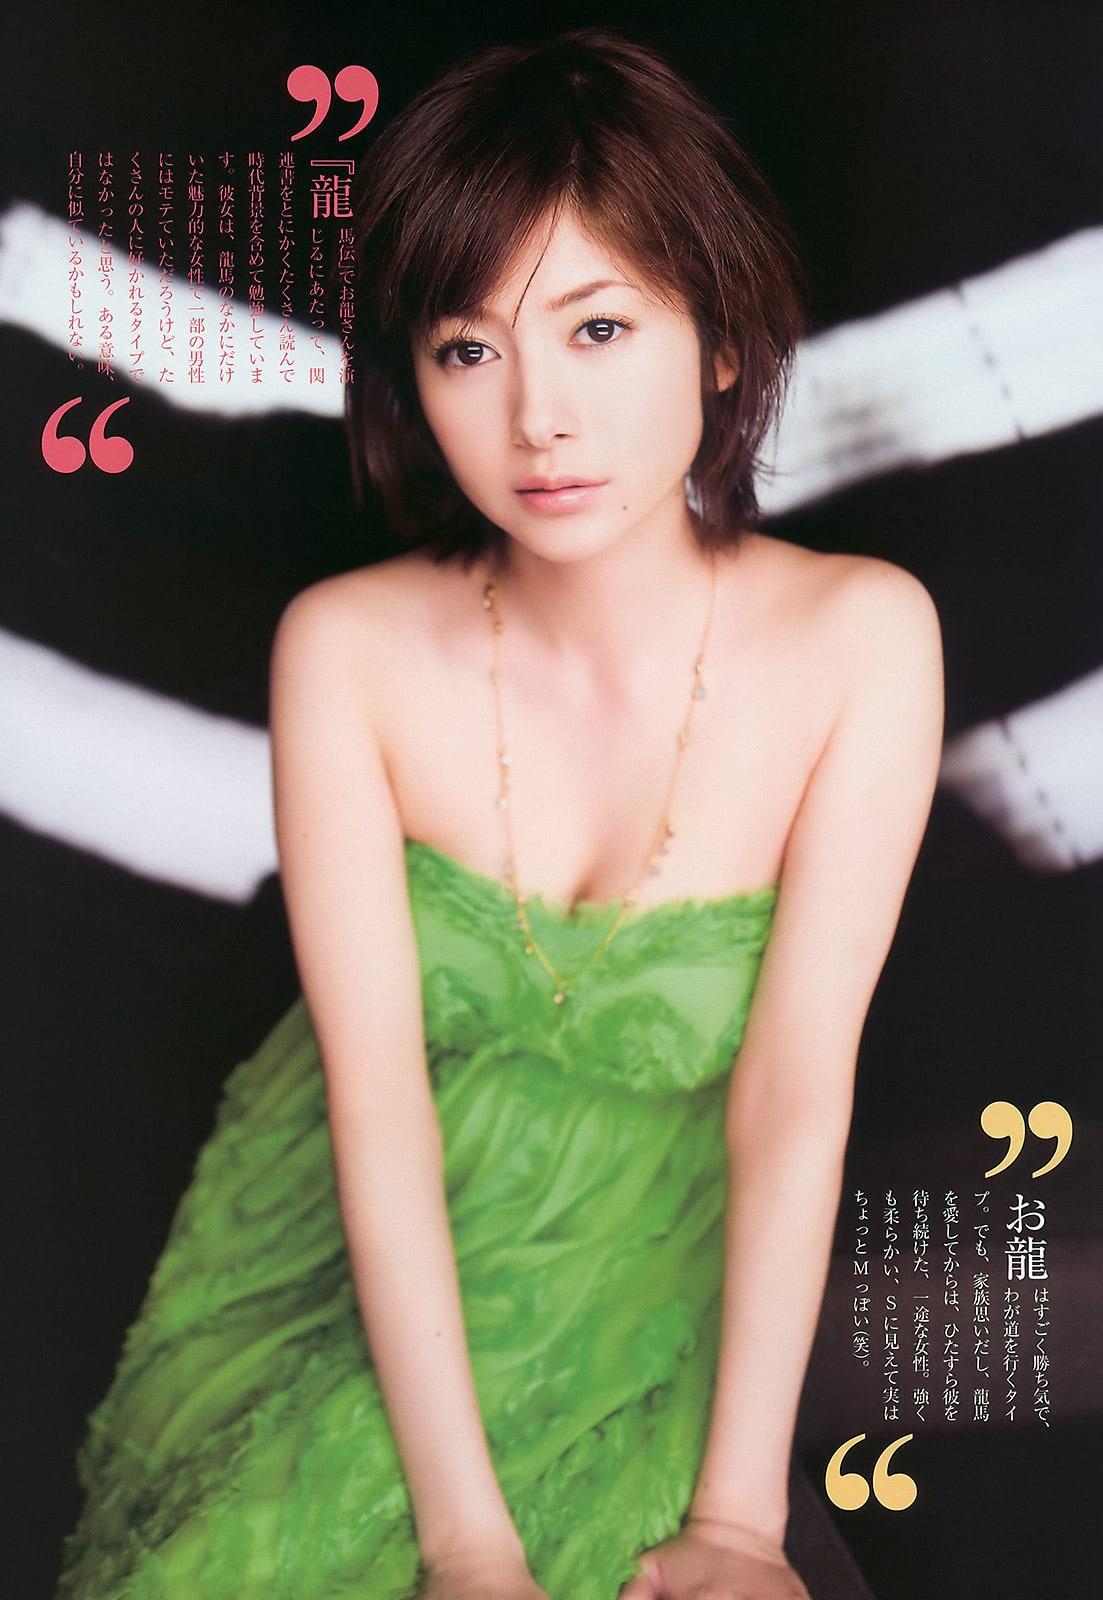 Yoko Maki Yoko Maki new picture